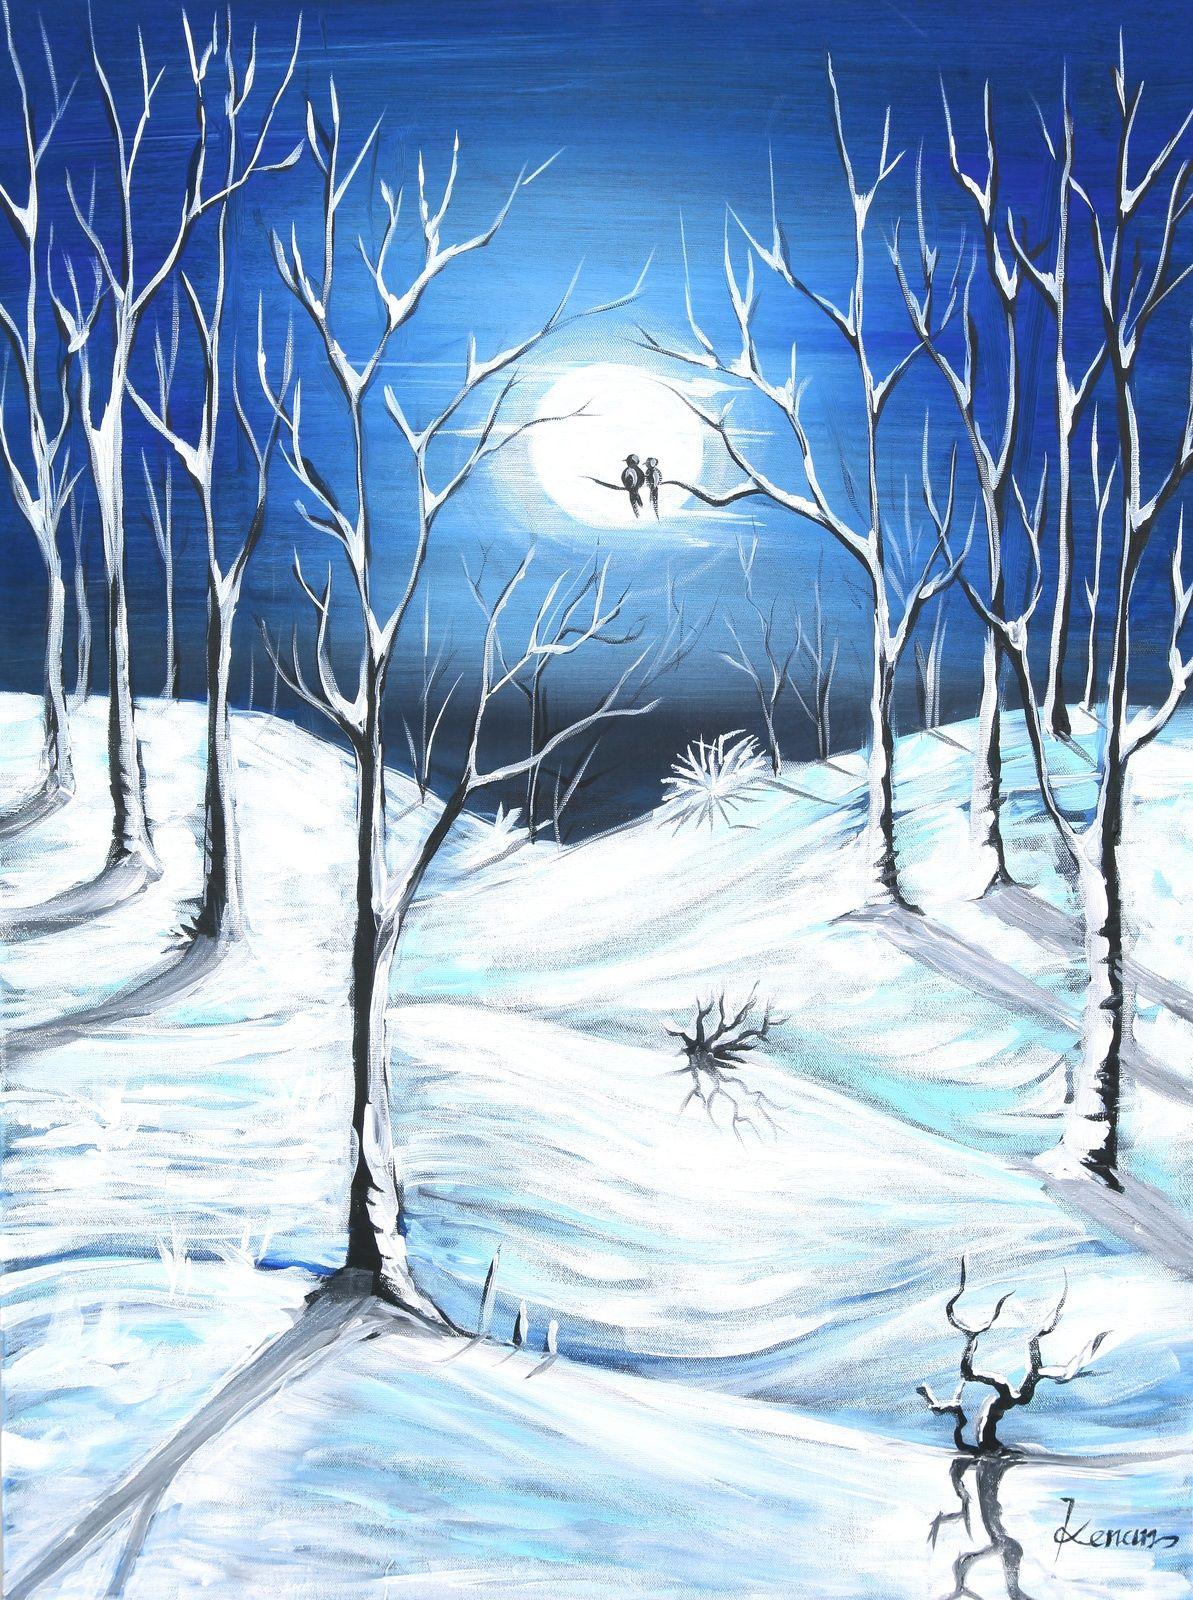 winter night 2014, Acrylic painting by kenan tuncay   Artfinder